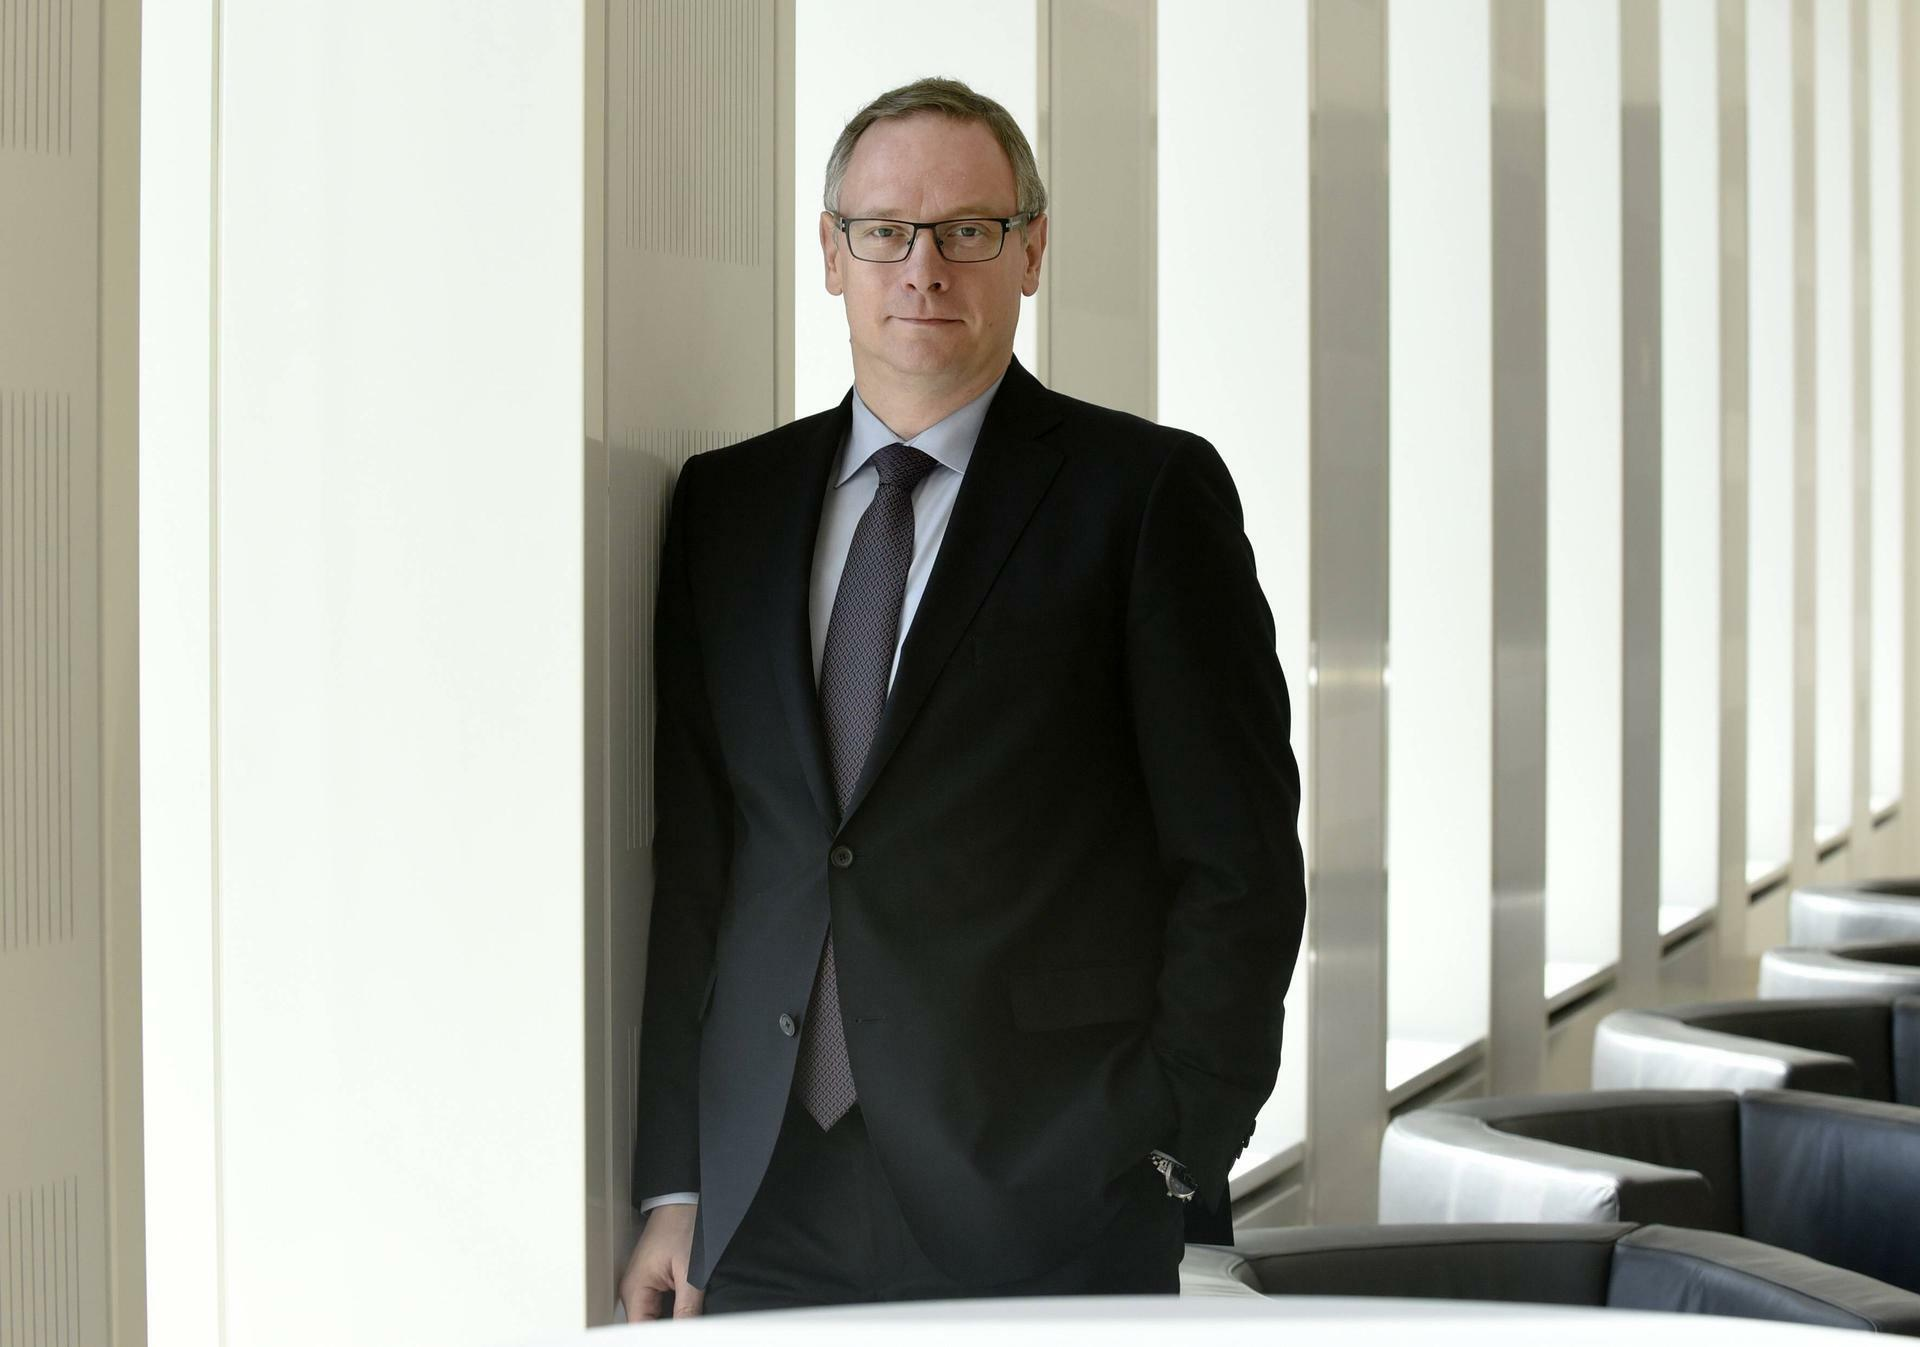 Sparkassen-Finanzgruppe: Georg Fahrenschon macht den Weg frei